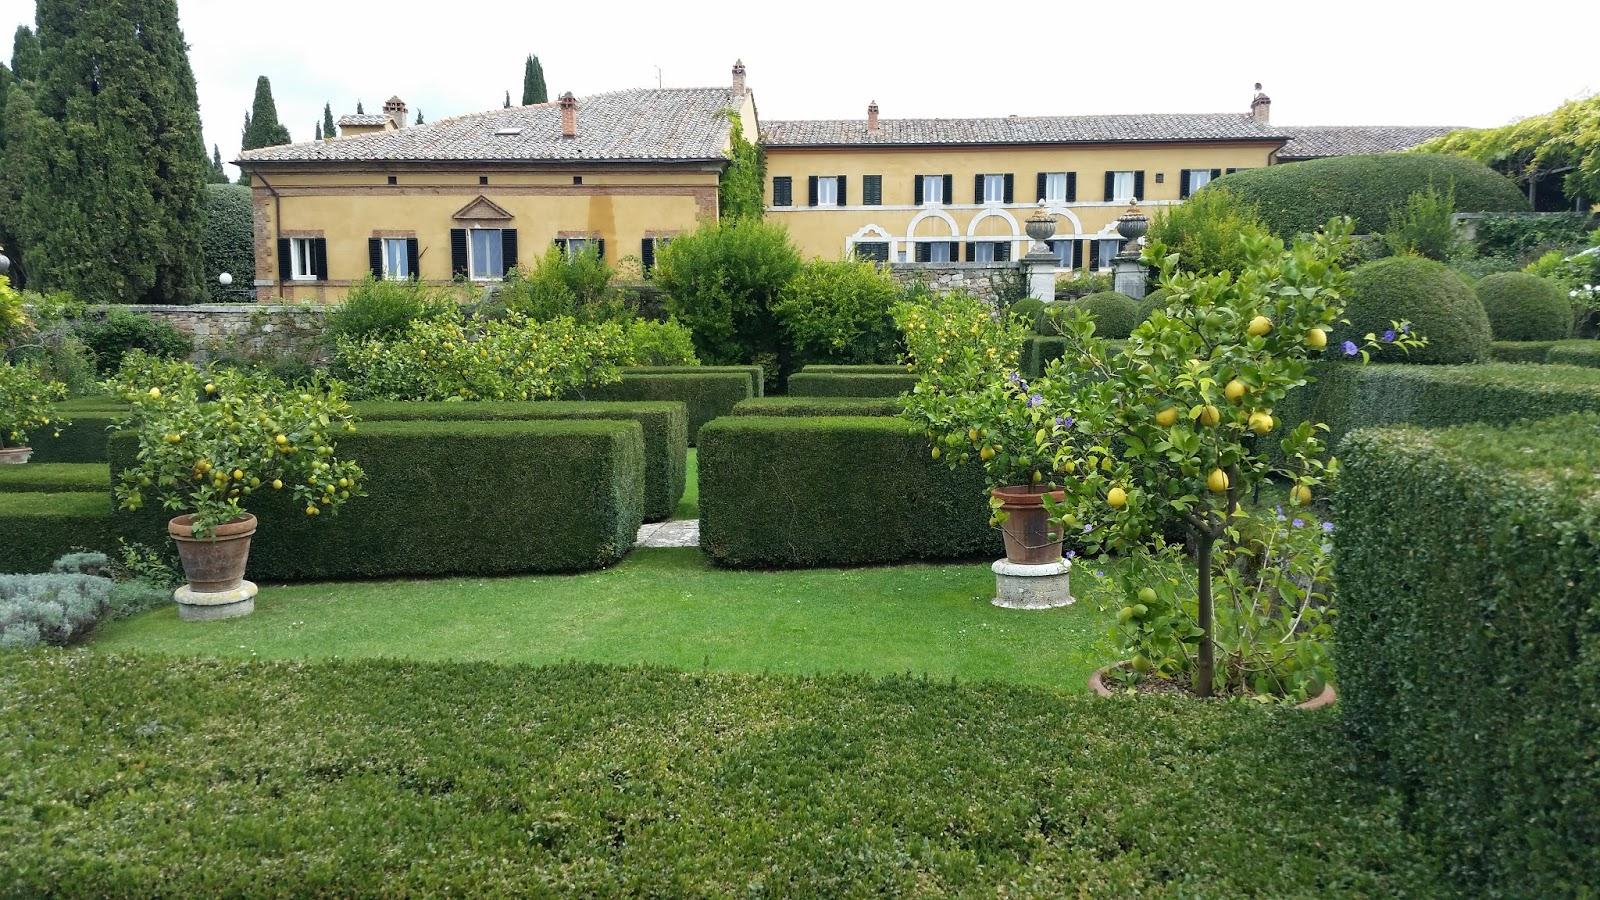 hortibus voyage palais et jardins prives de toscane bottin mondain. Black Bedroom Furniture Sets. Home Design Ideas